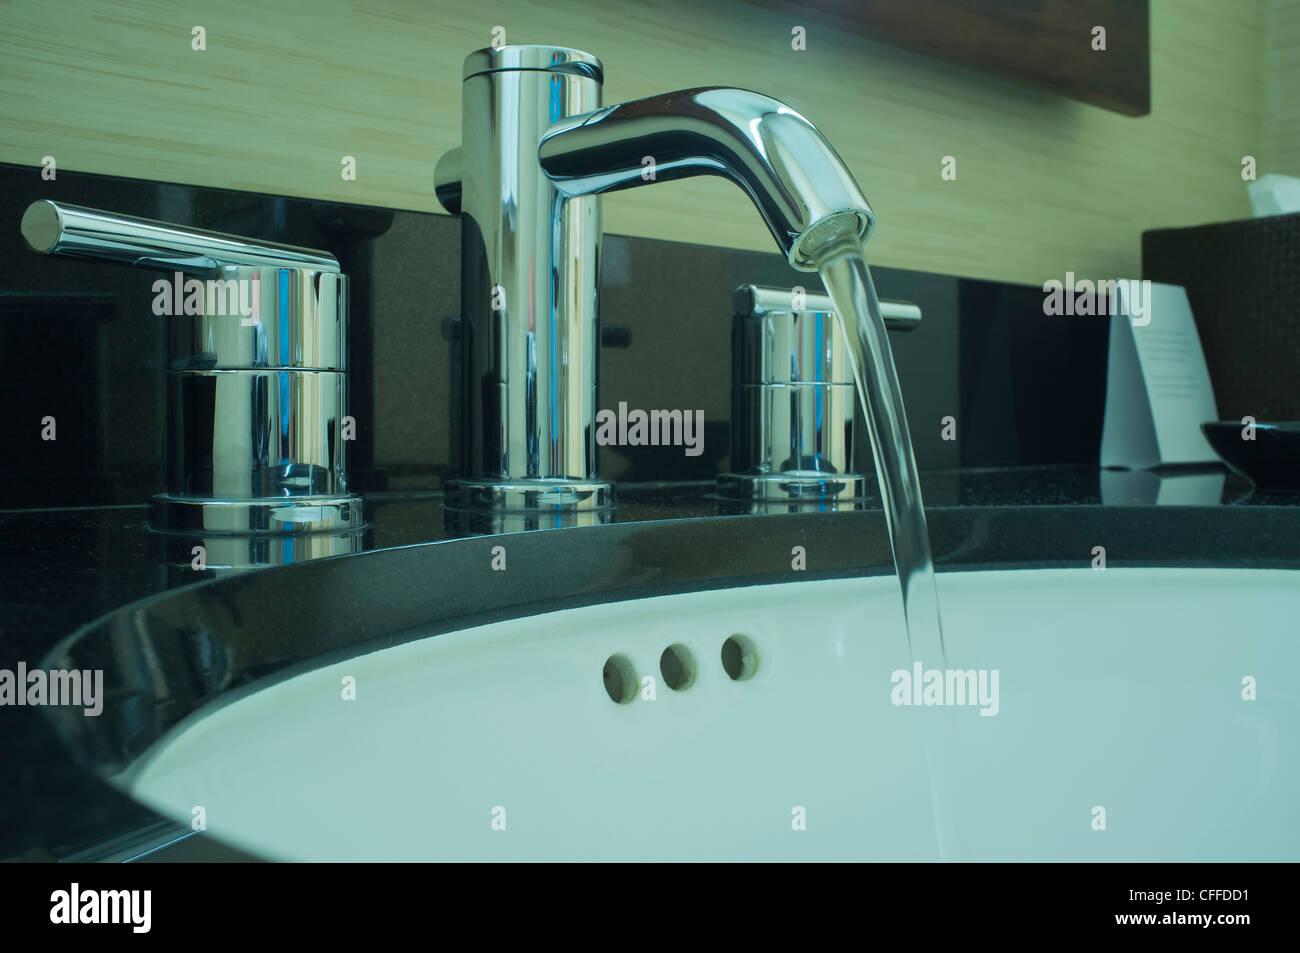 Modern Water Faucet Stock Photos & Modern Water Faucet Stock Images ...